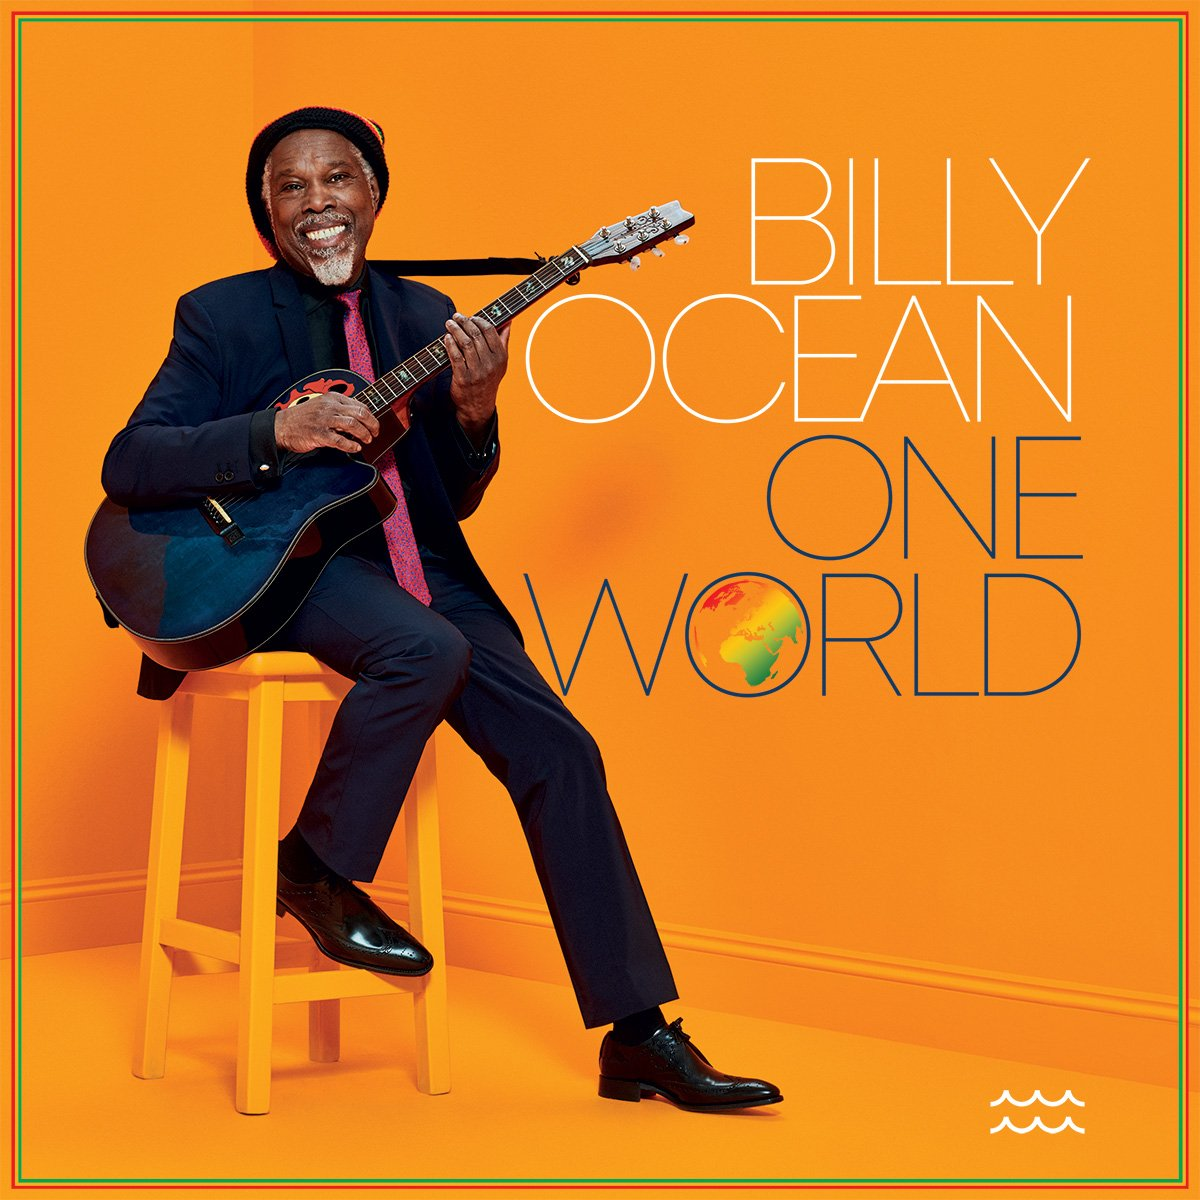 New Billy Ocean Album – 'One World'